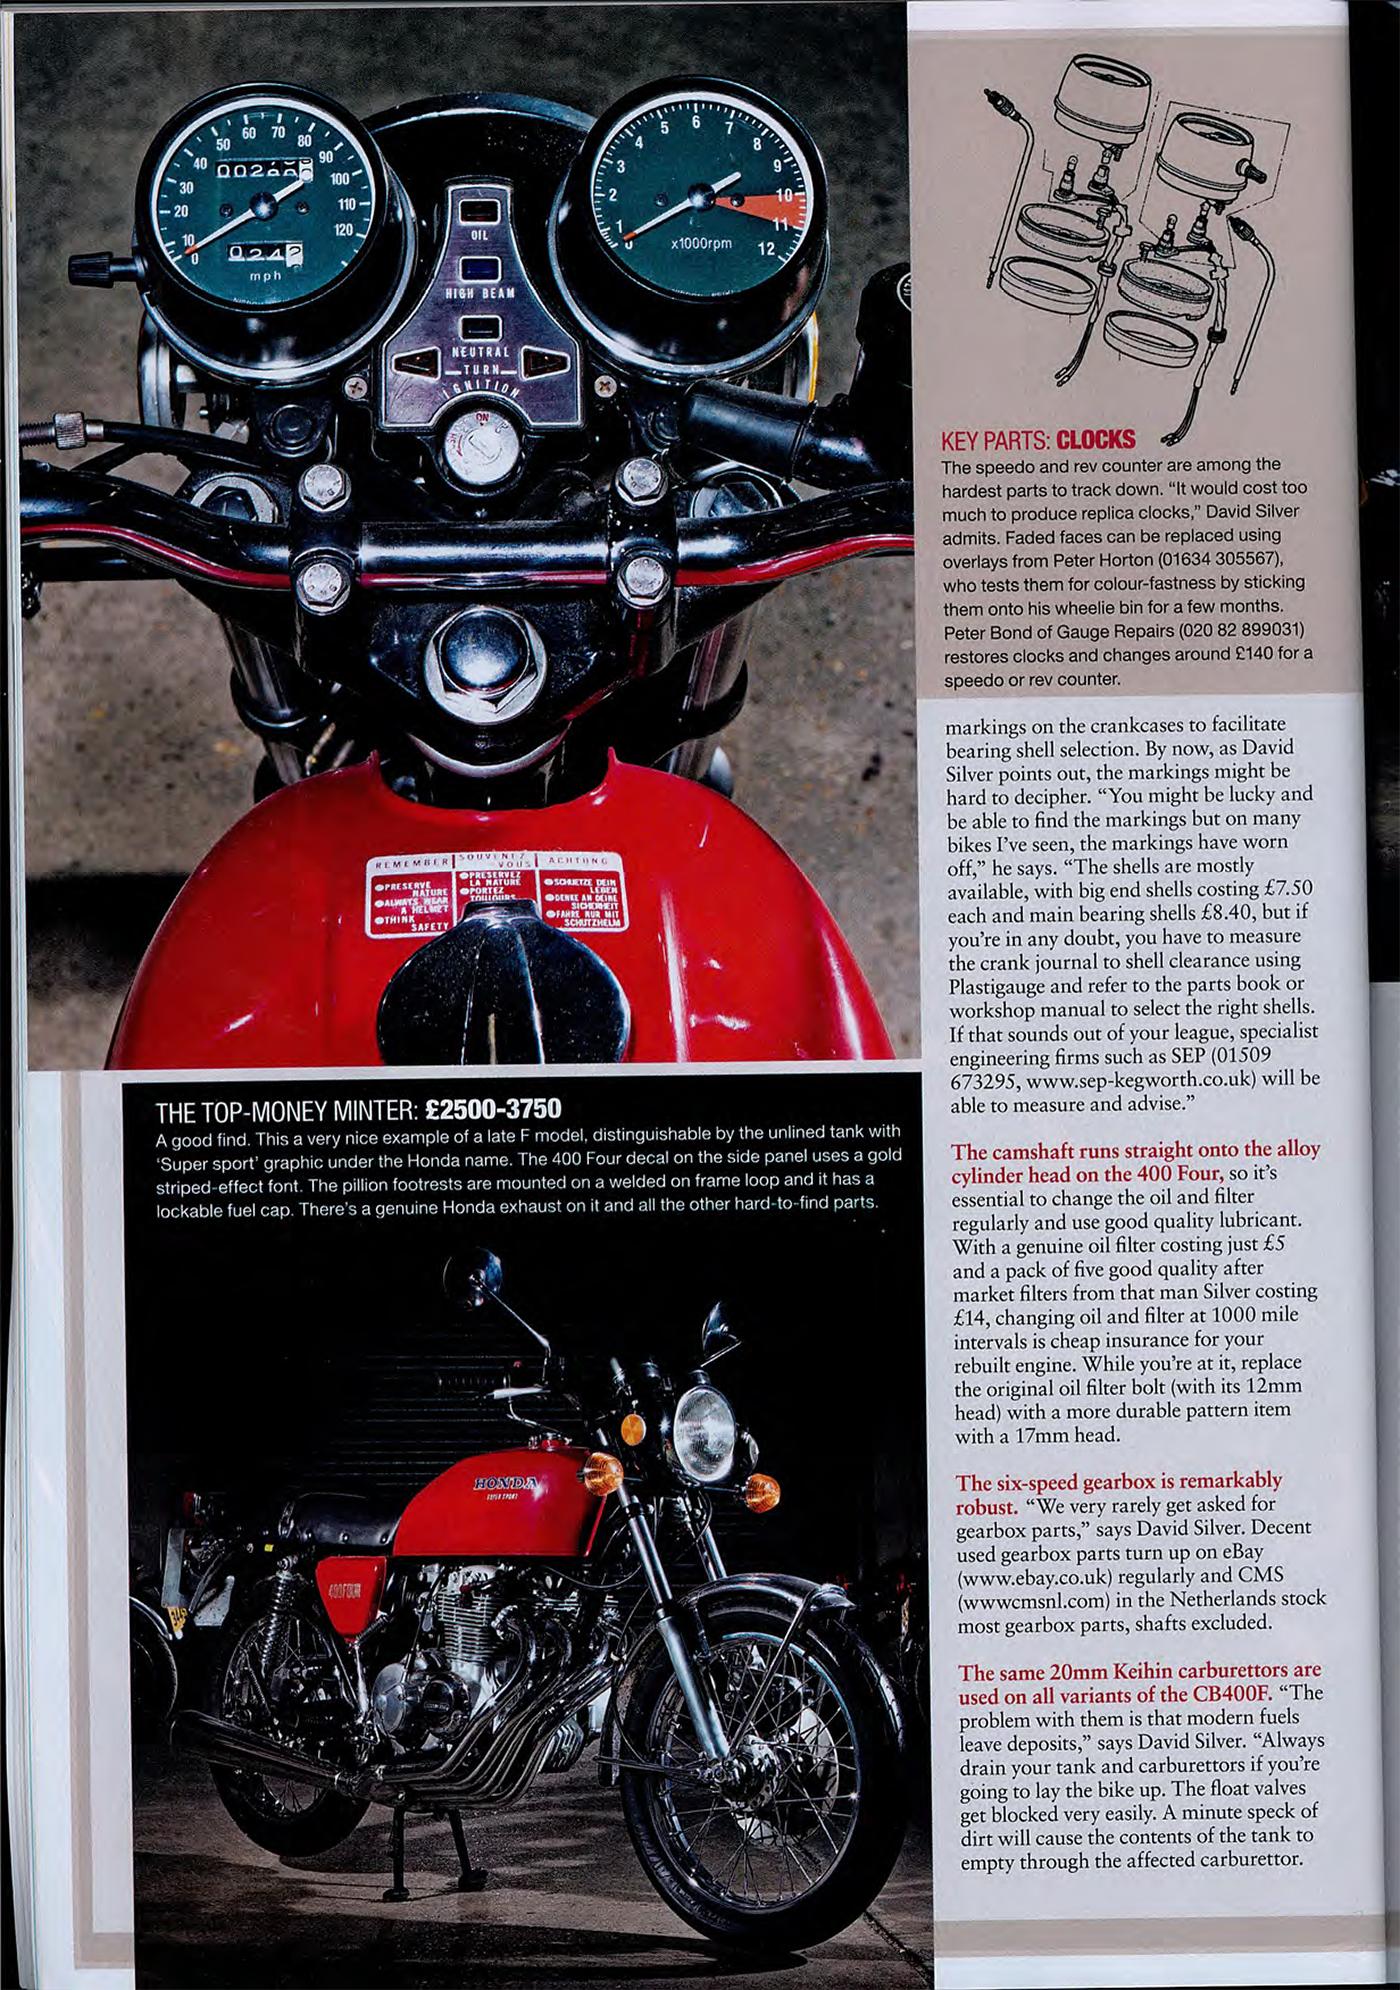 Why I Had To Buy A Honda 400 Four | 4into1.com Vintage ...